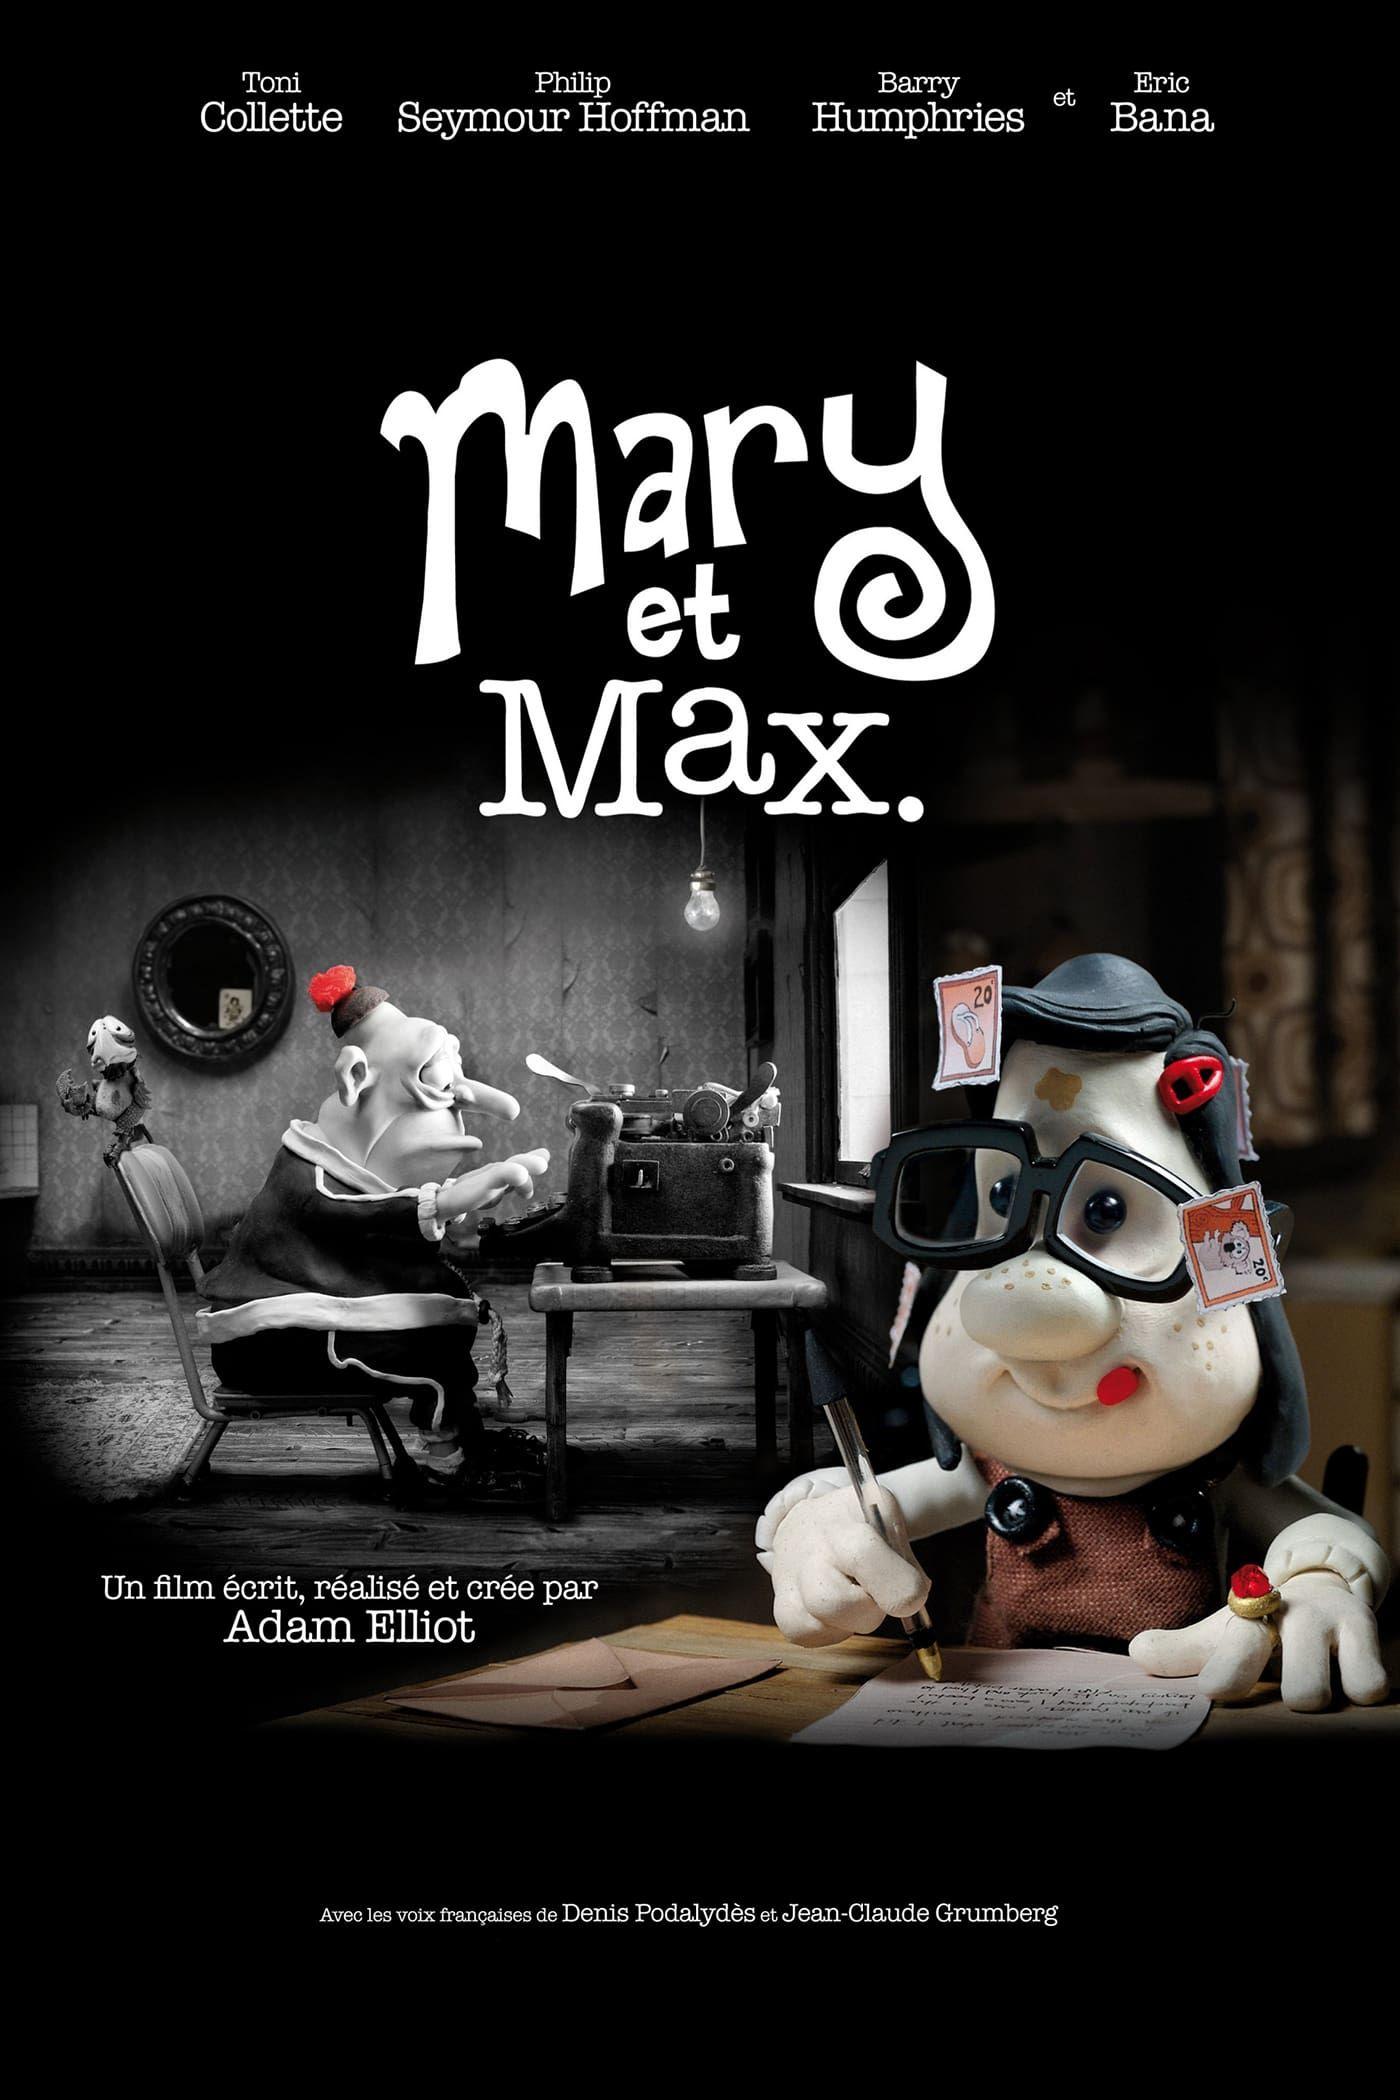 Download Mary And Max Filme Cmplet Dublad Nline Film Sinema Arkadaslar